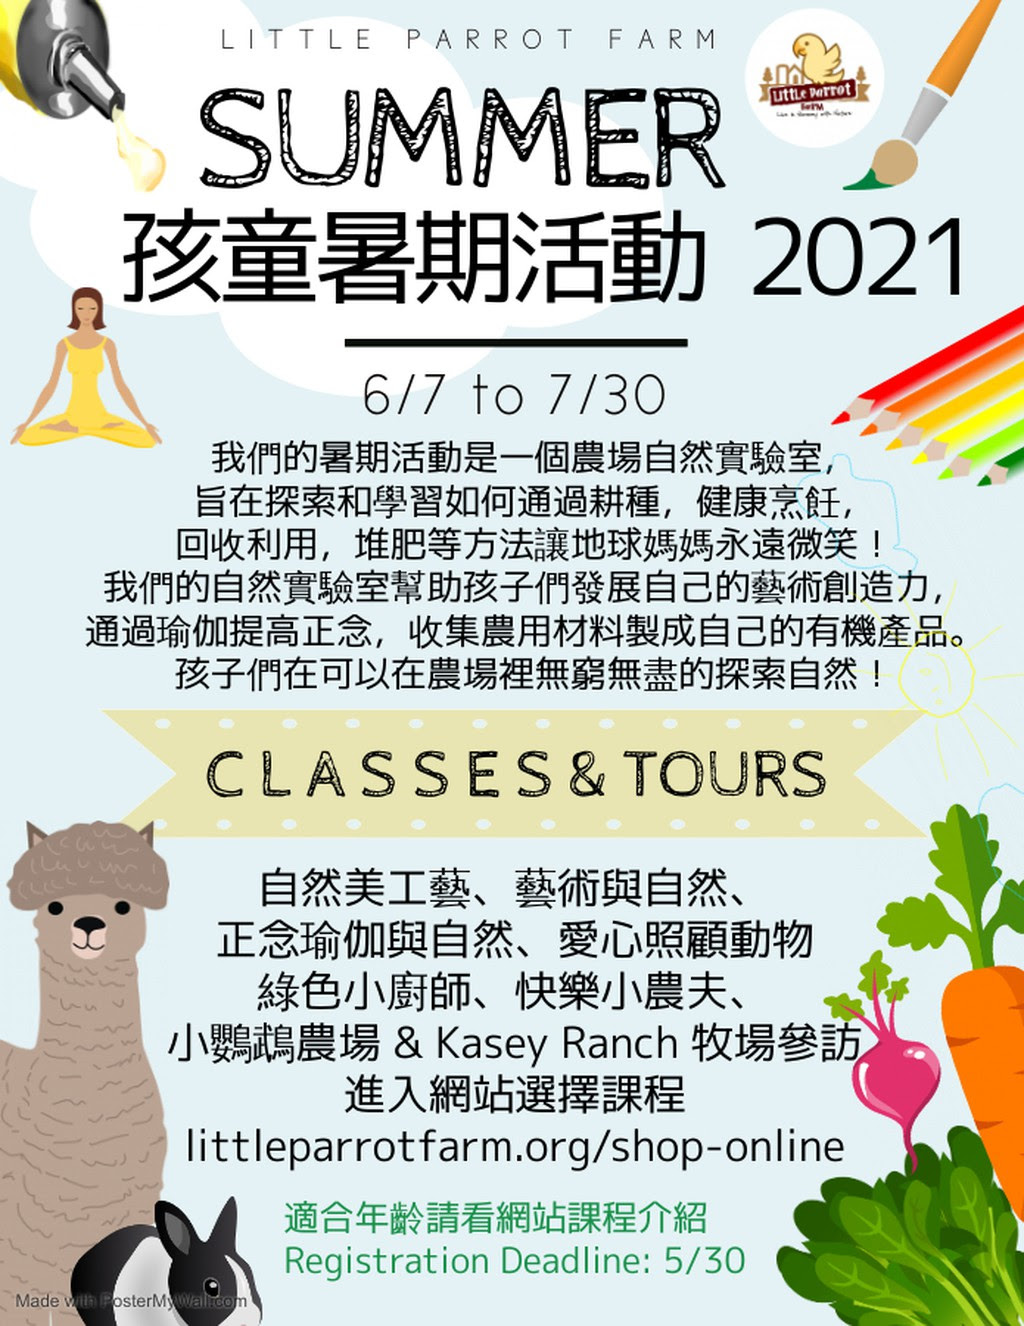 2021 Summer Camp at Little Parrot Farm 小鸚鵡農場 暑期營